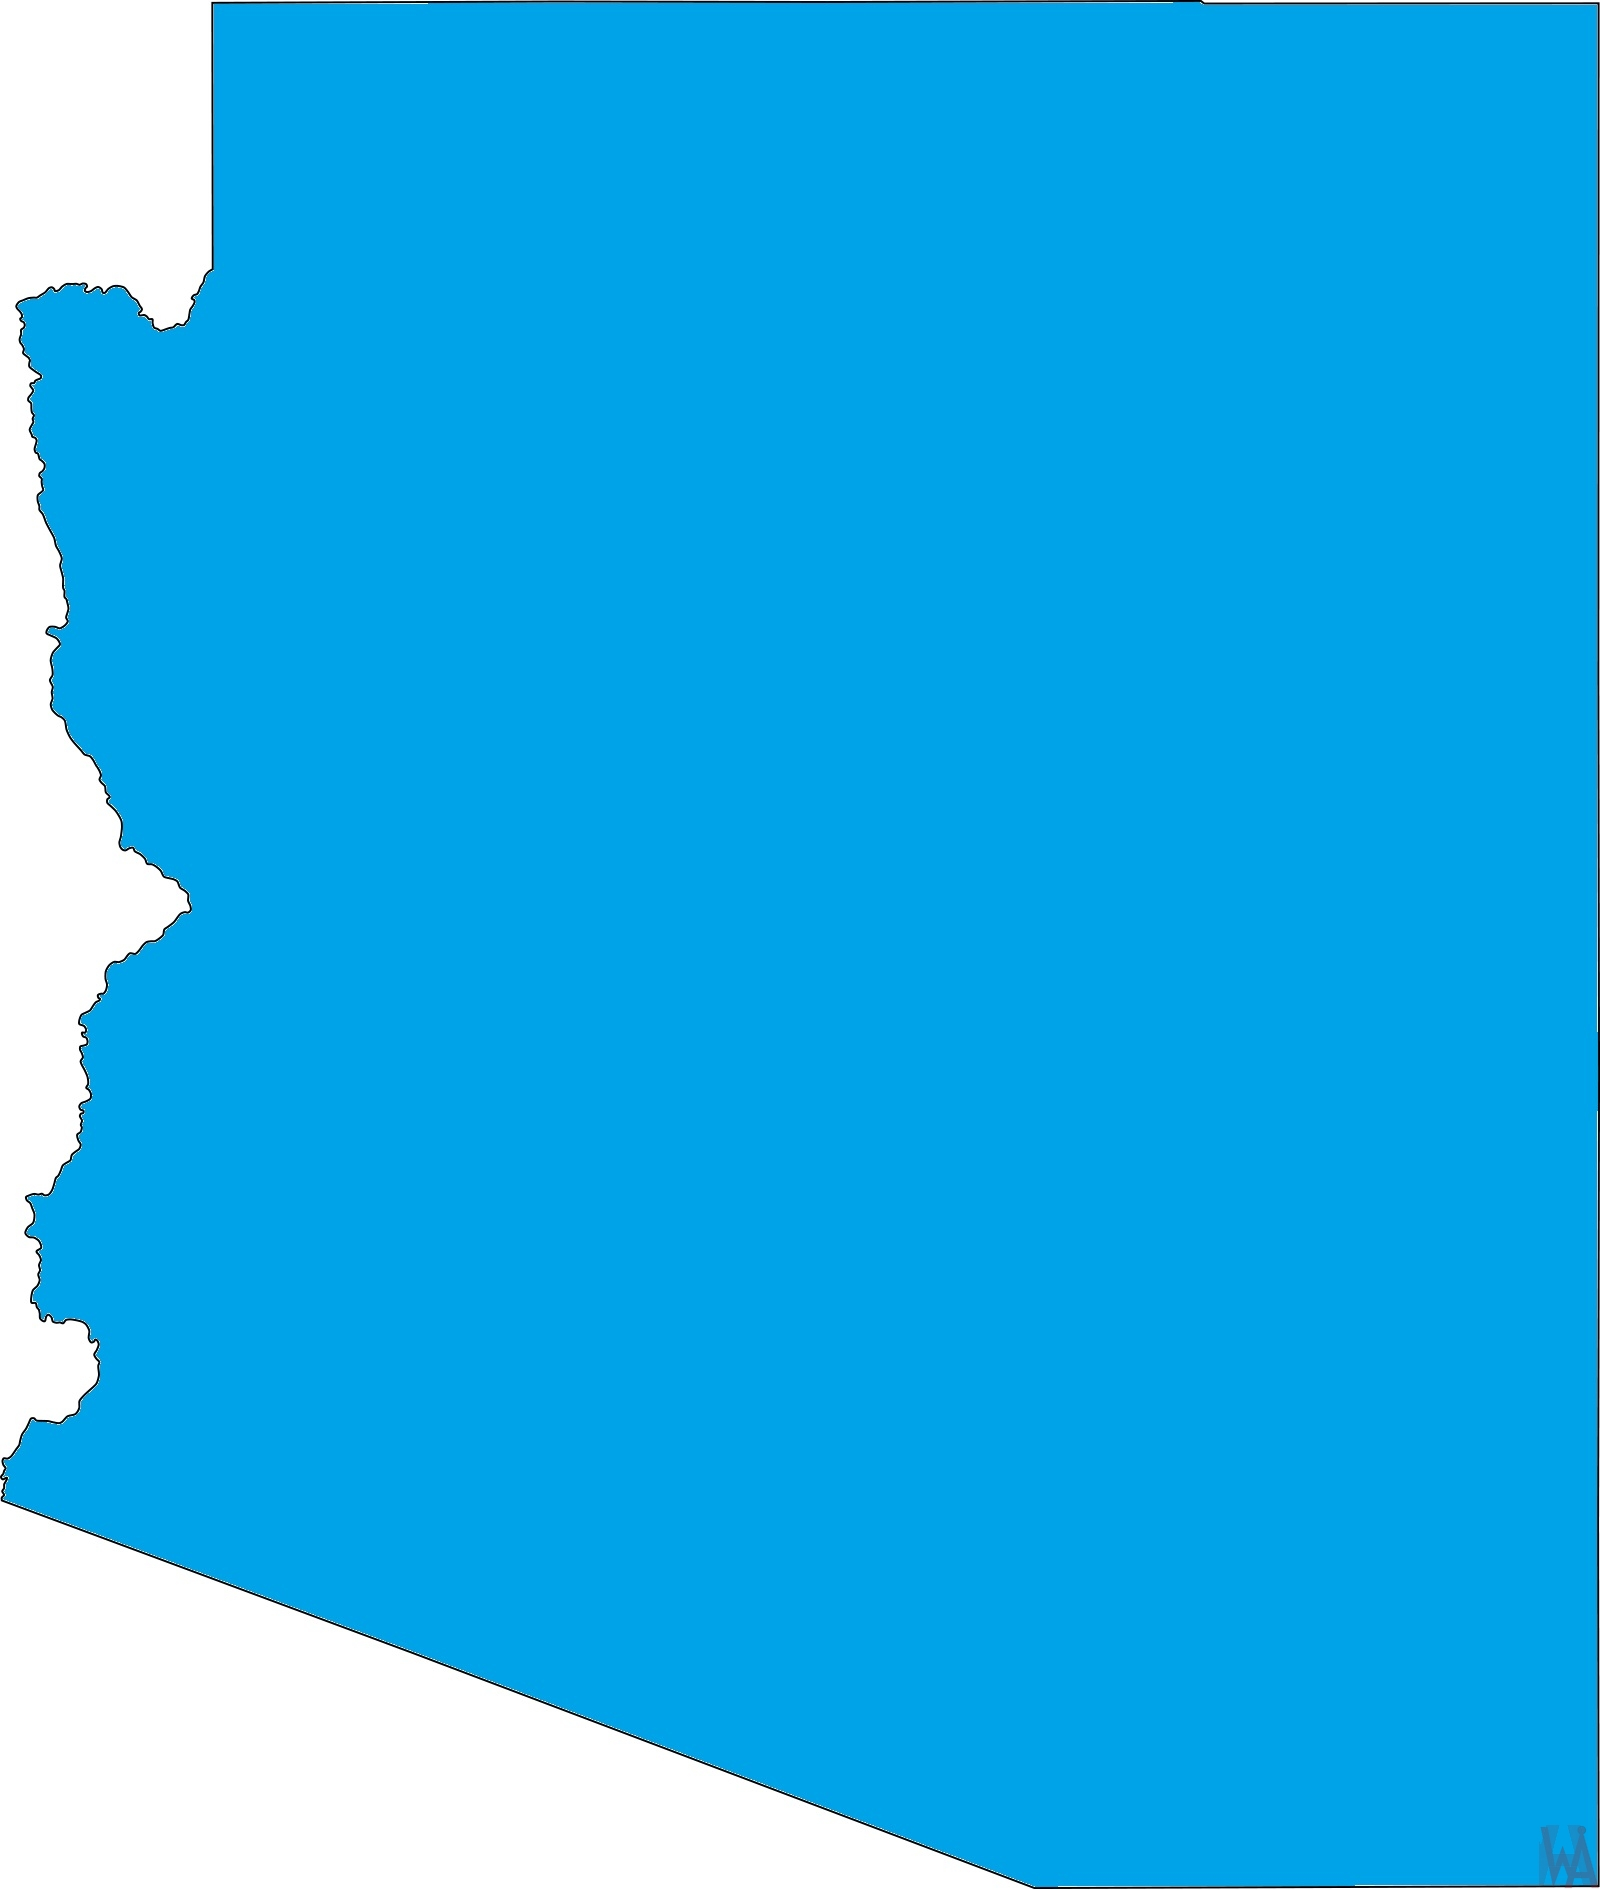 Arizona Blank Outline Map |  Blank Outline Map of Arizona – 1